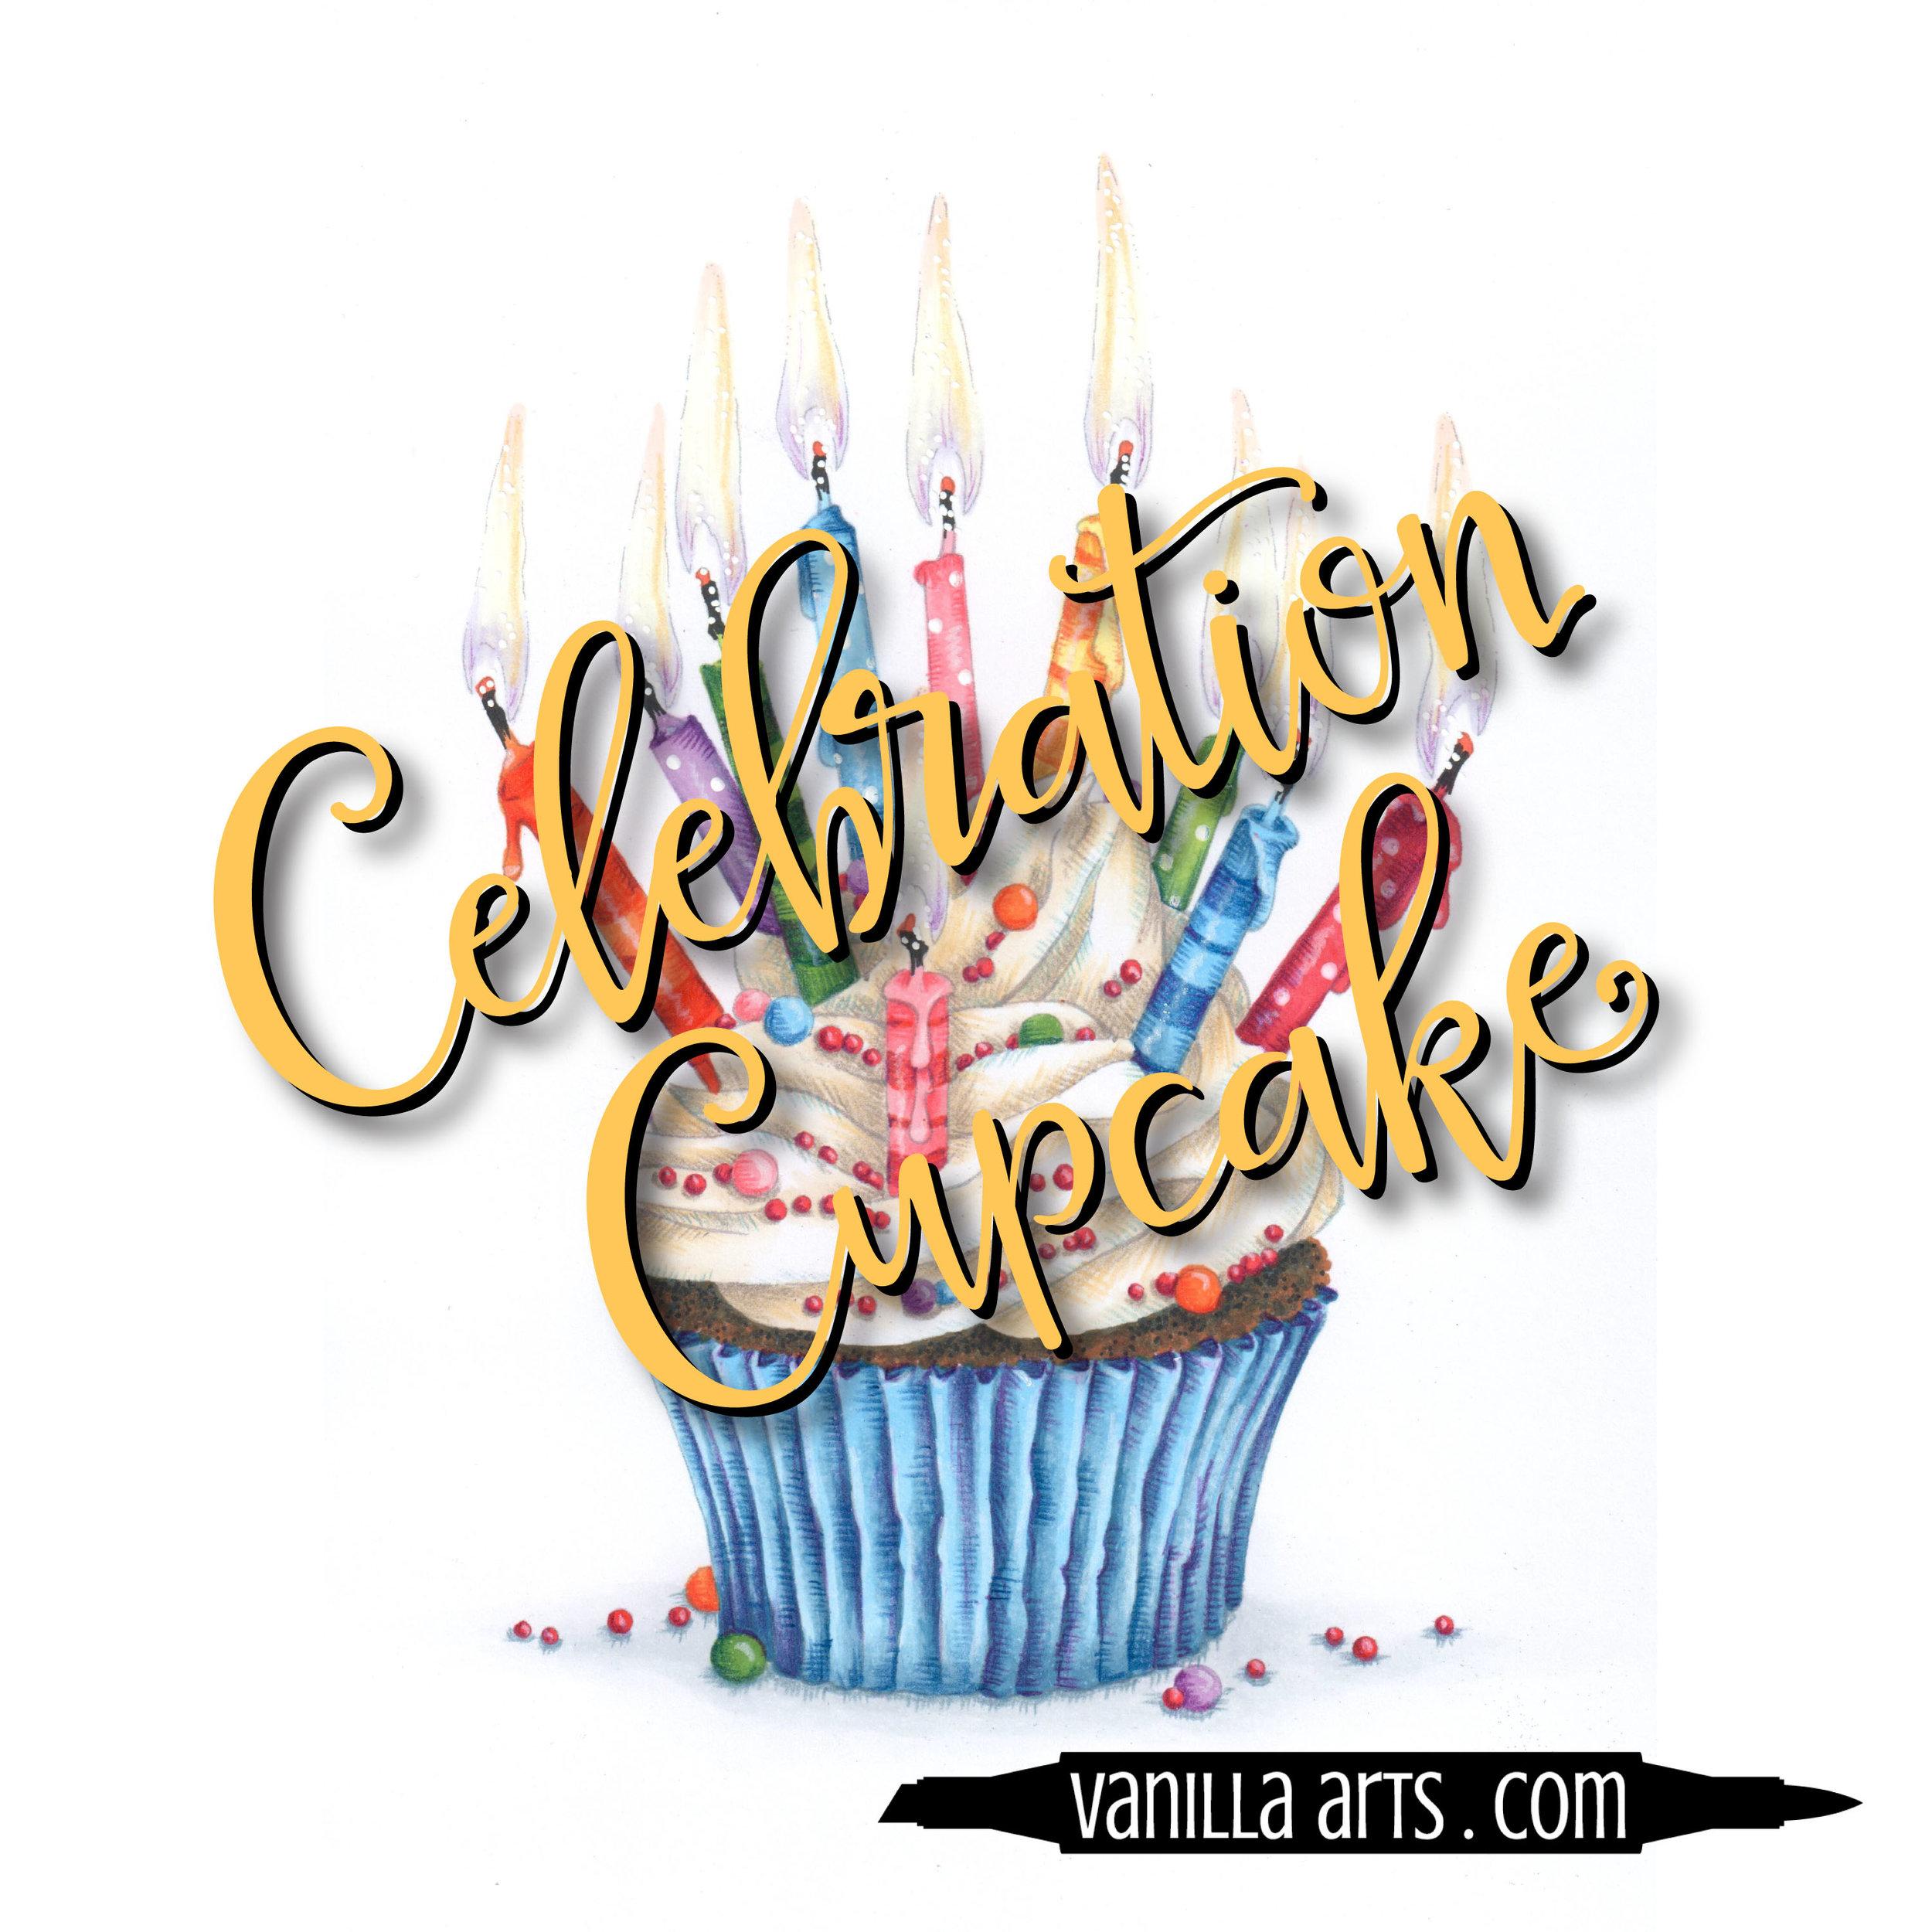 """Celebration Cupcake"" a digital stamp image designed especially for marker coloring | VanillaArts.com"